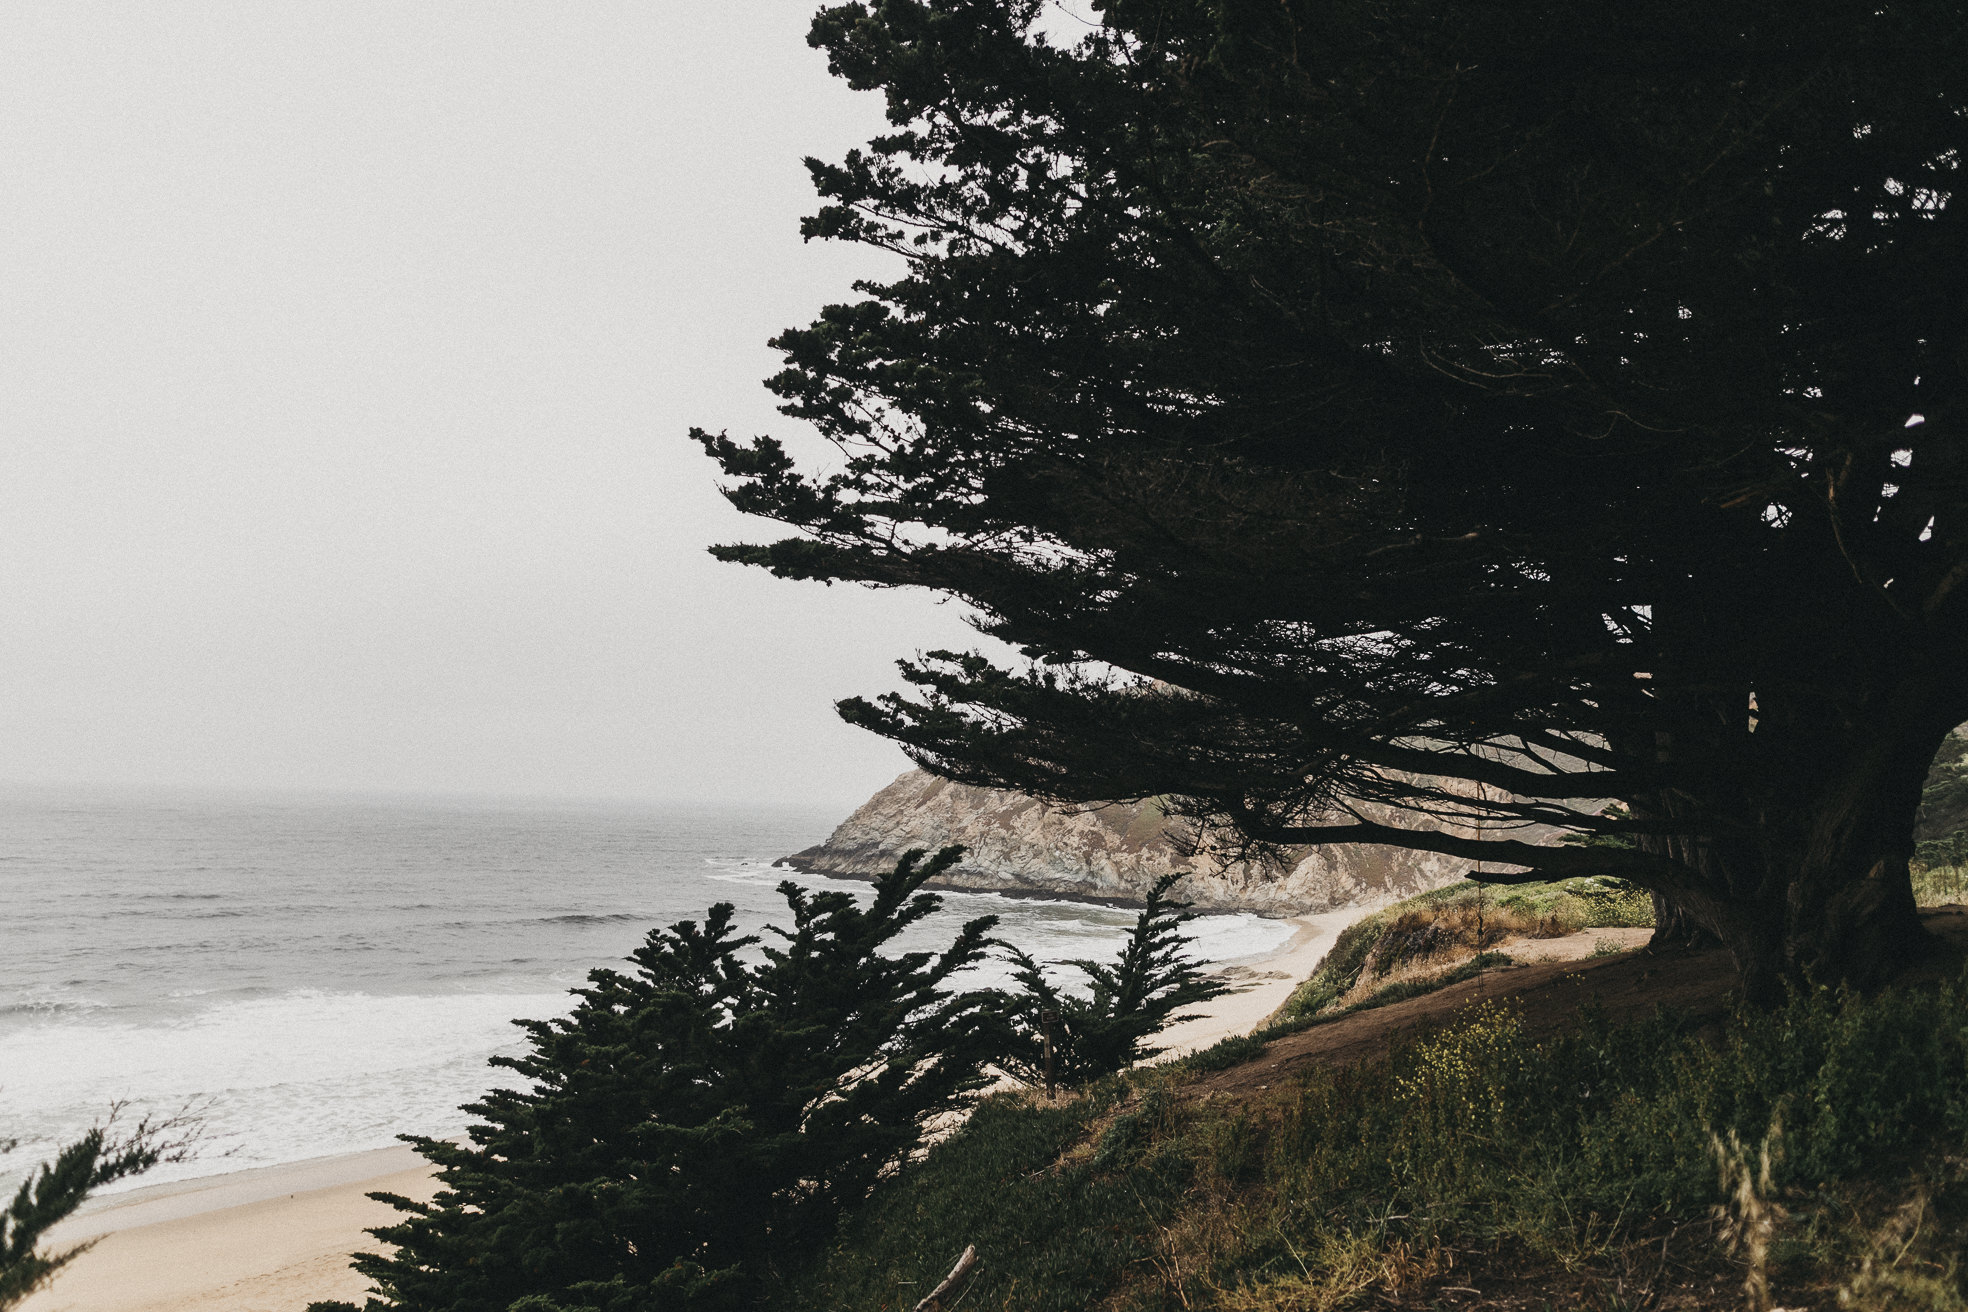 San-Francisco-BildervomLeben-9897